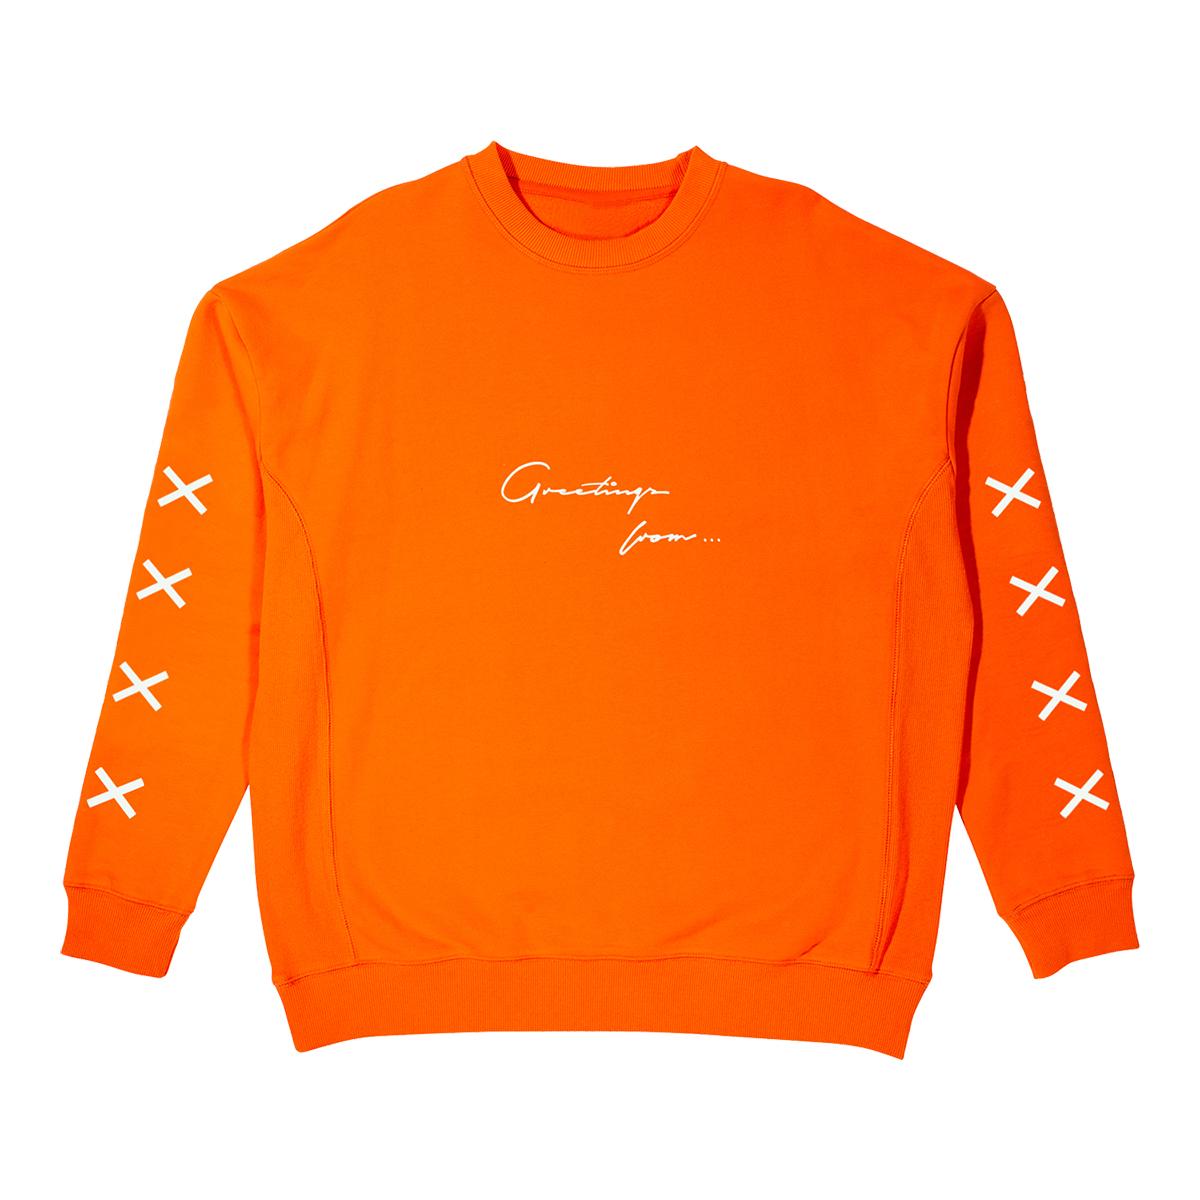 Father of Asahd Orange Crewneck Sweatshirt